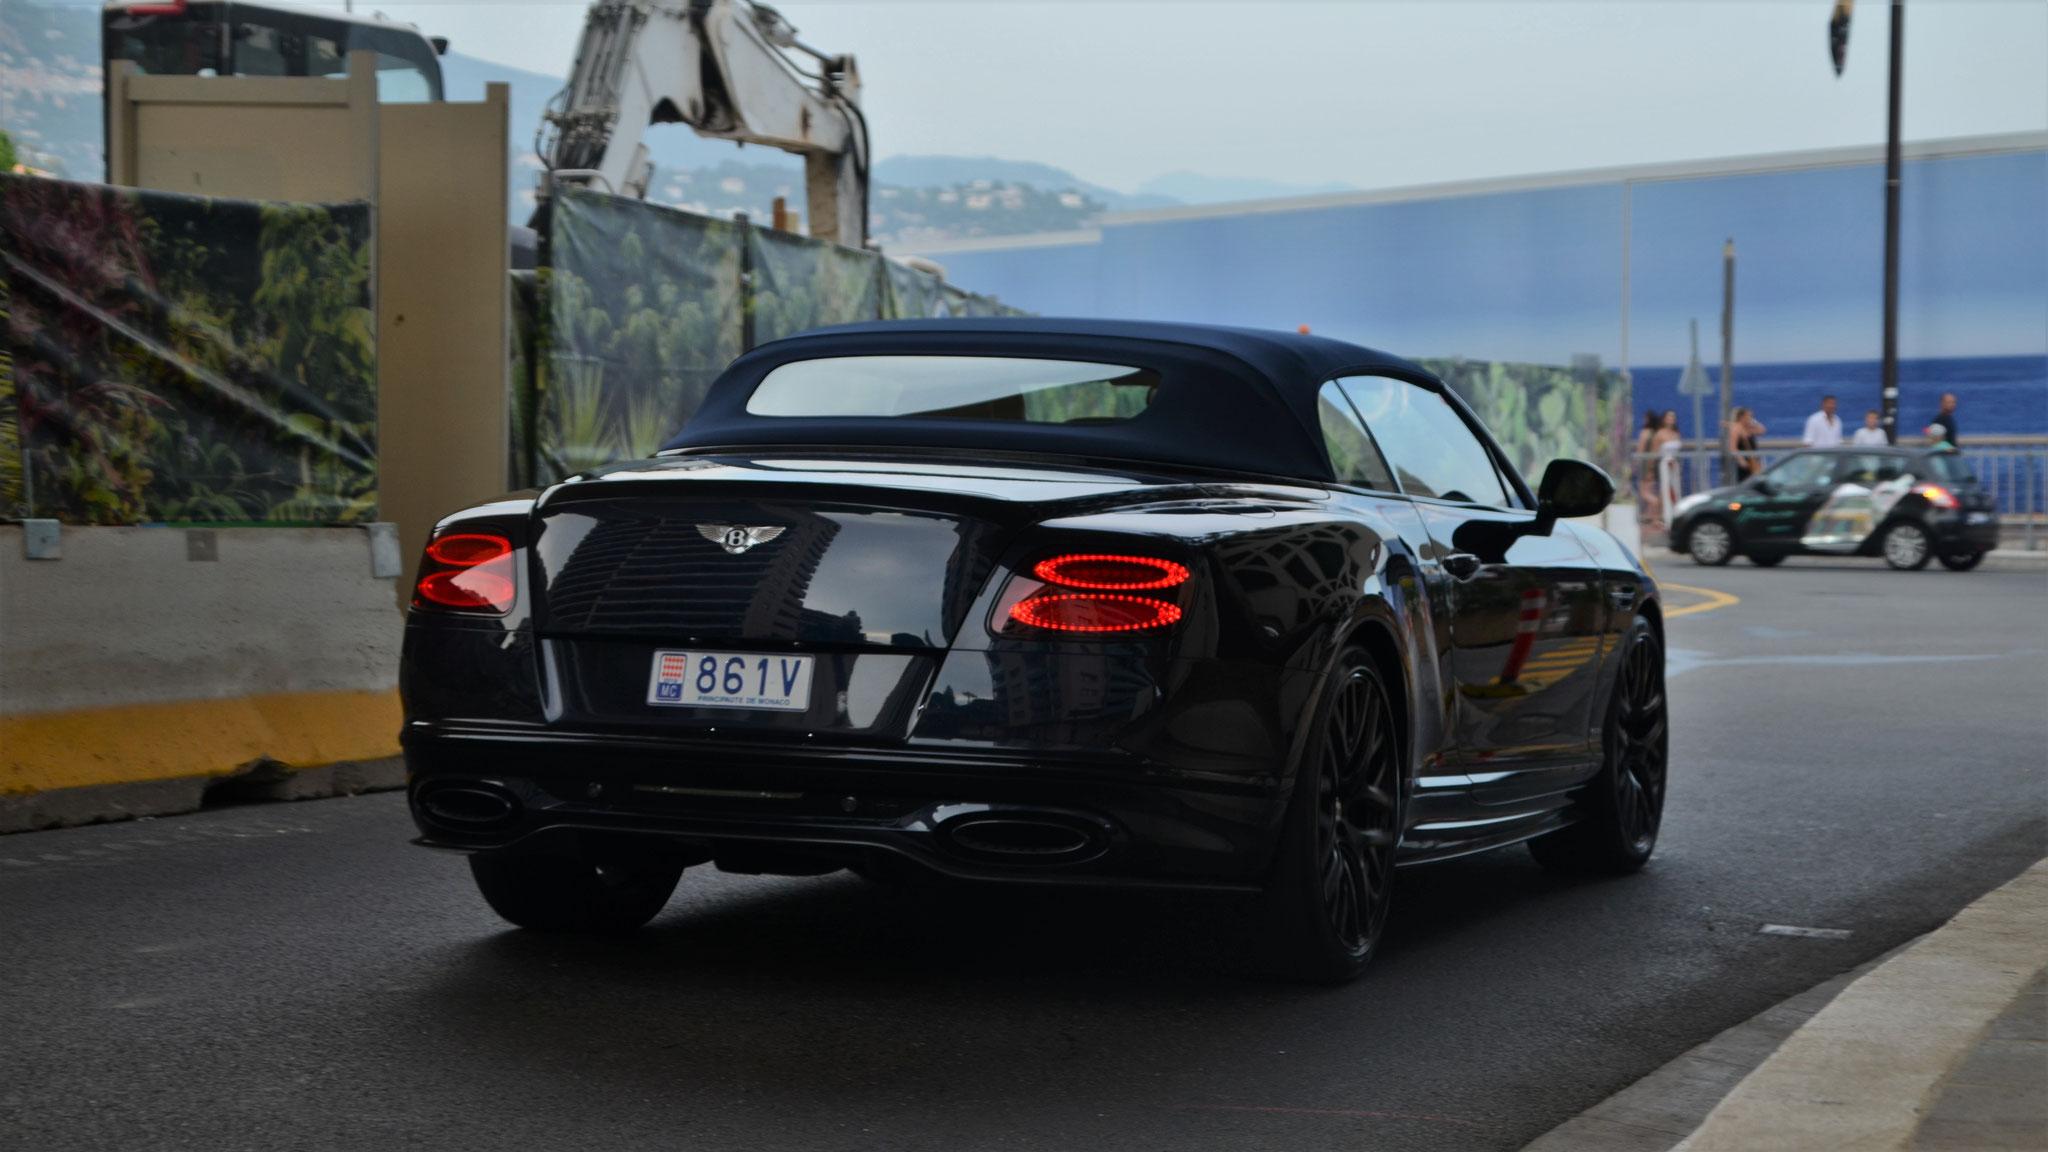 Bentley Continental GTC Supersports - 861V (MC)